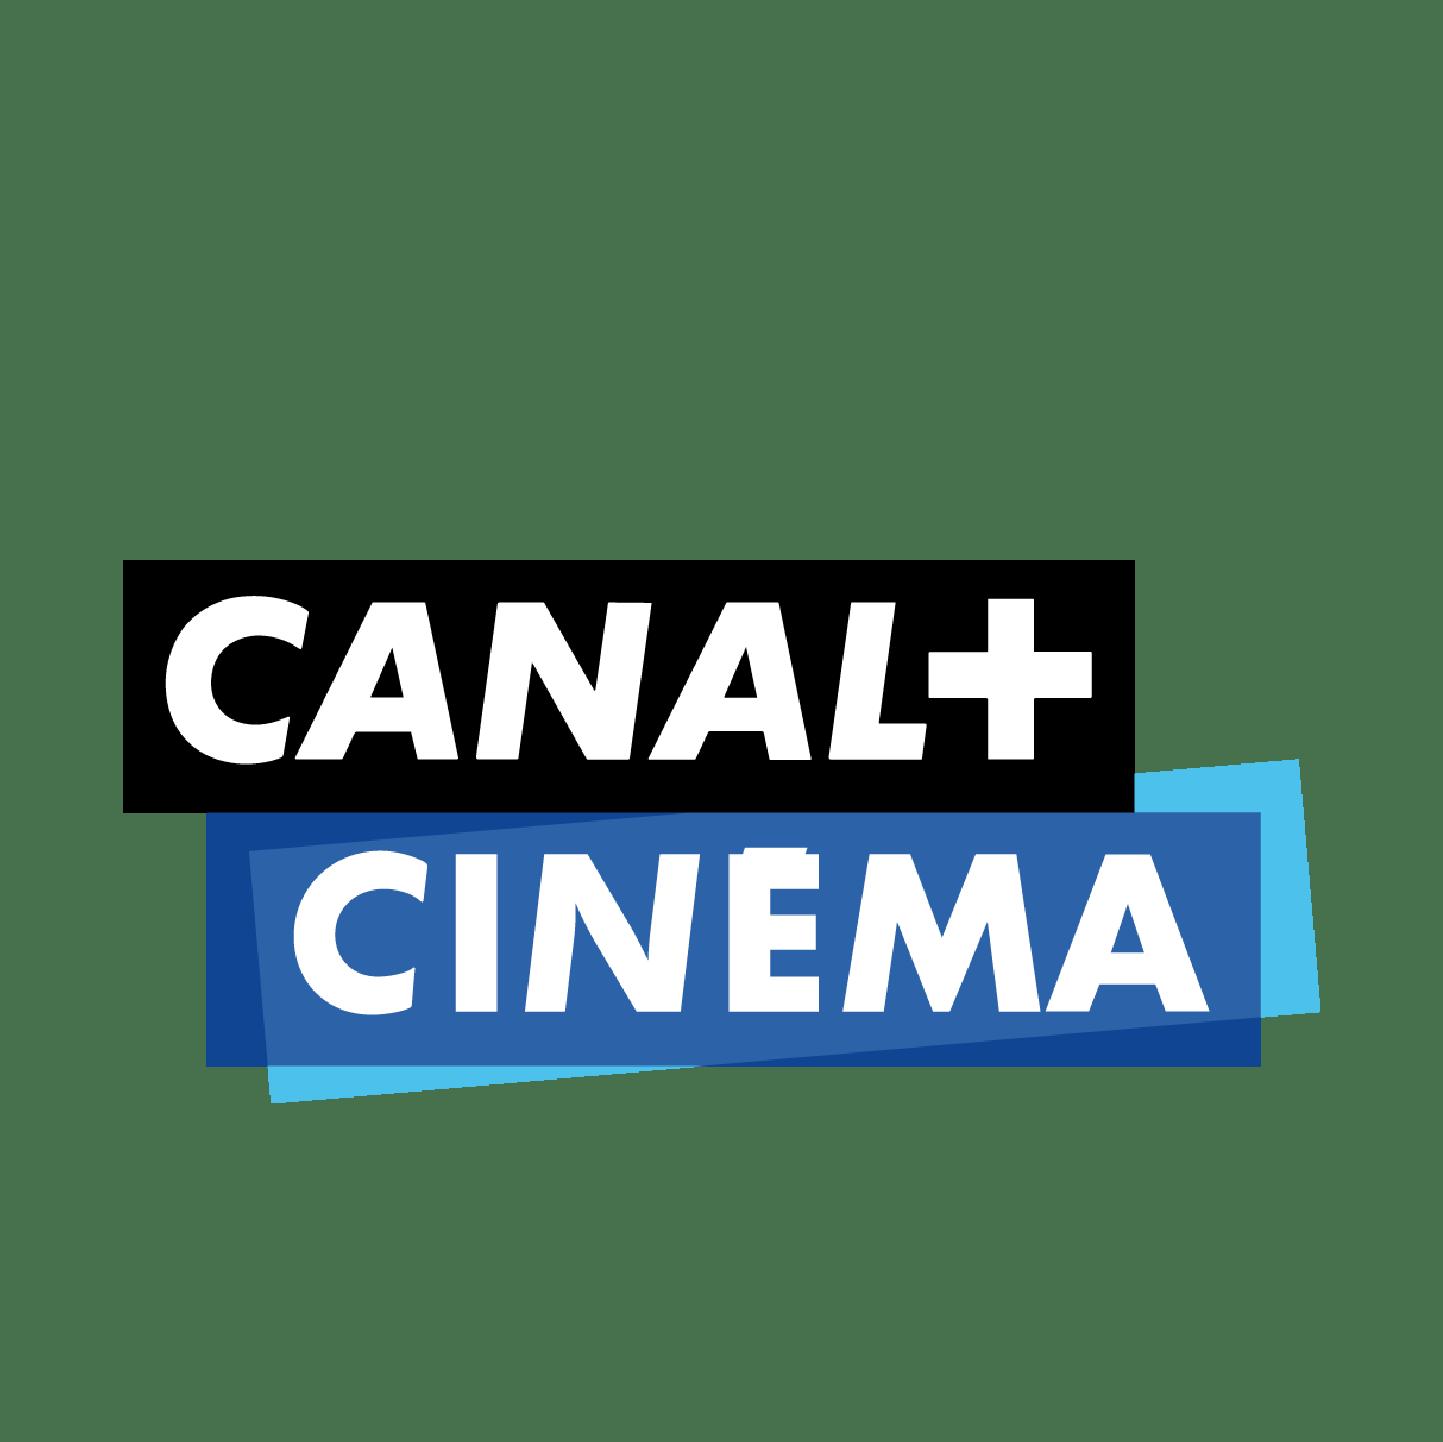 logo CANAL+ Cinéma